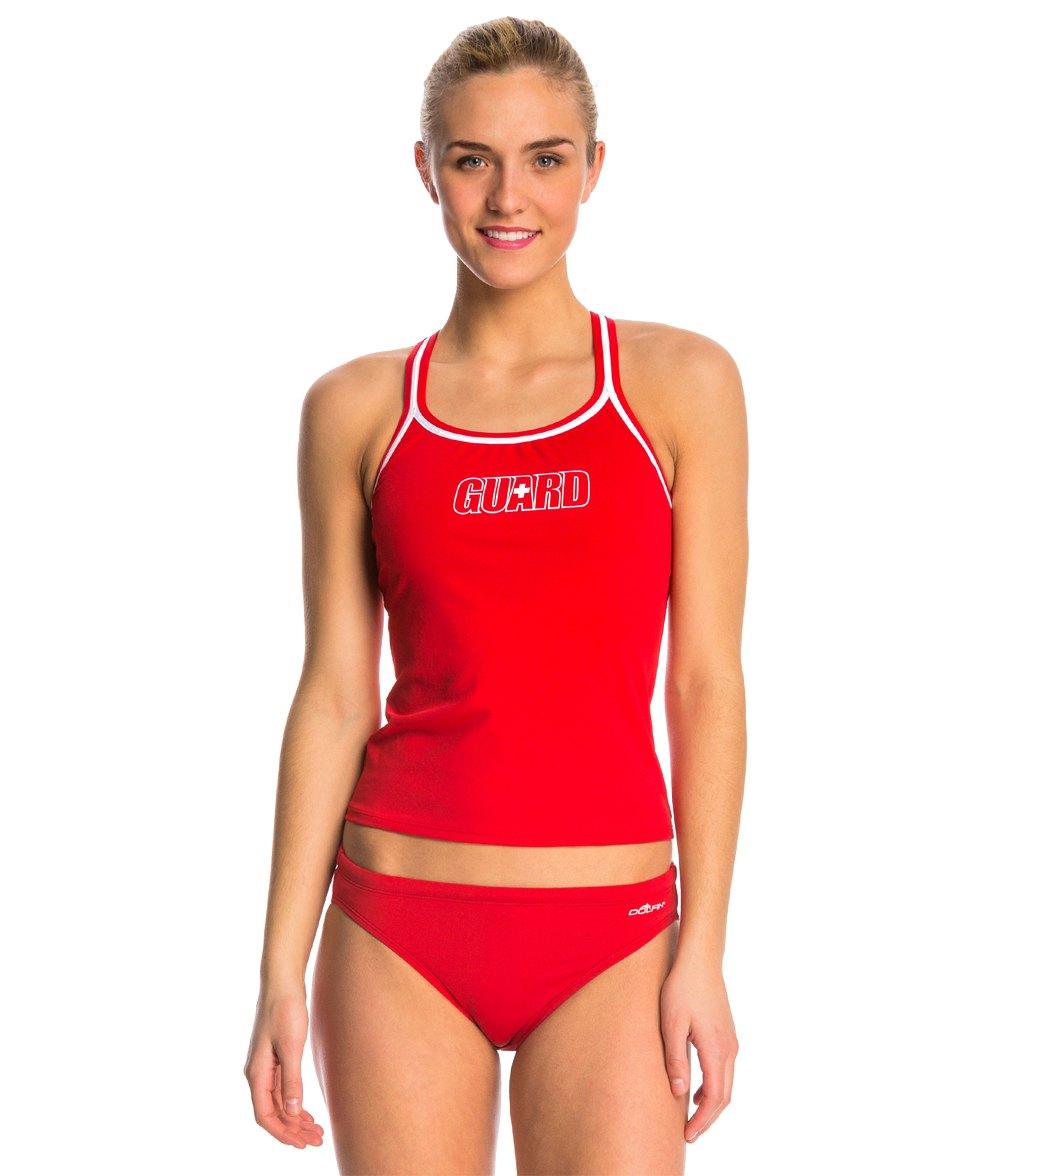 63cb8b06c1 Dolfin Lifeguard Tankini Swimsuit Top at SwimOutlet.com